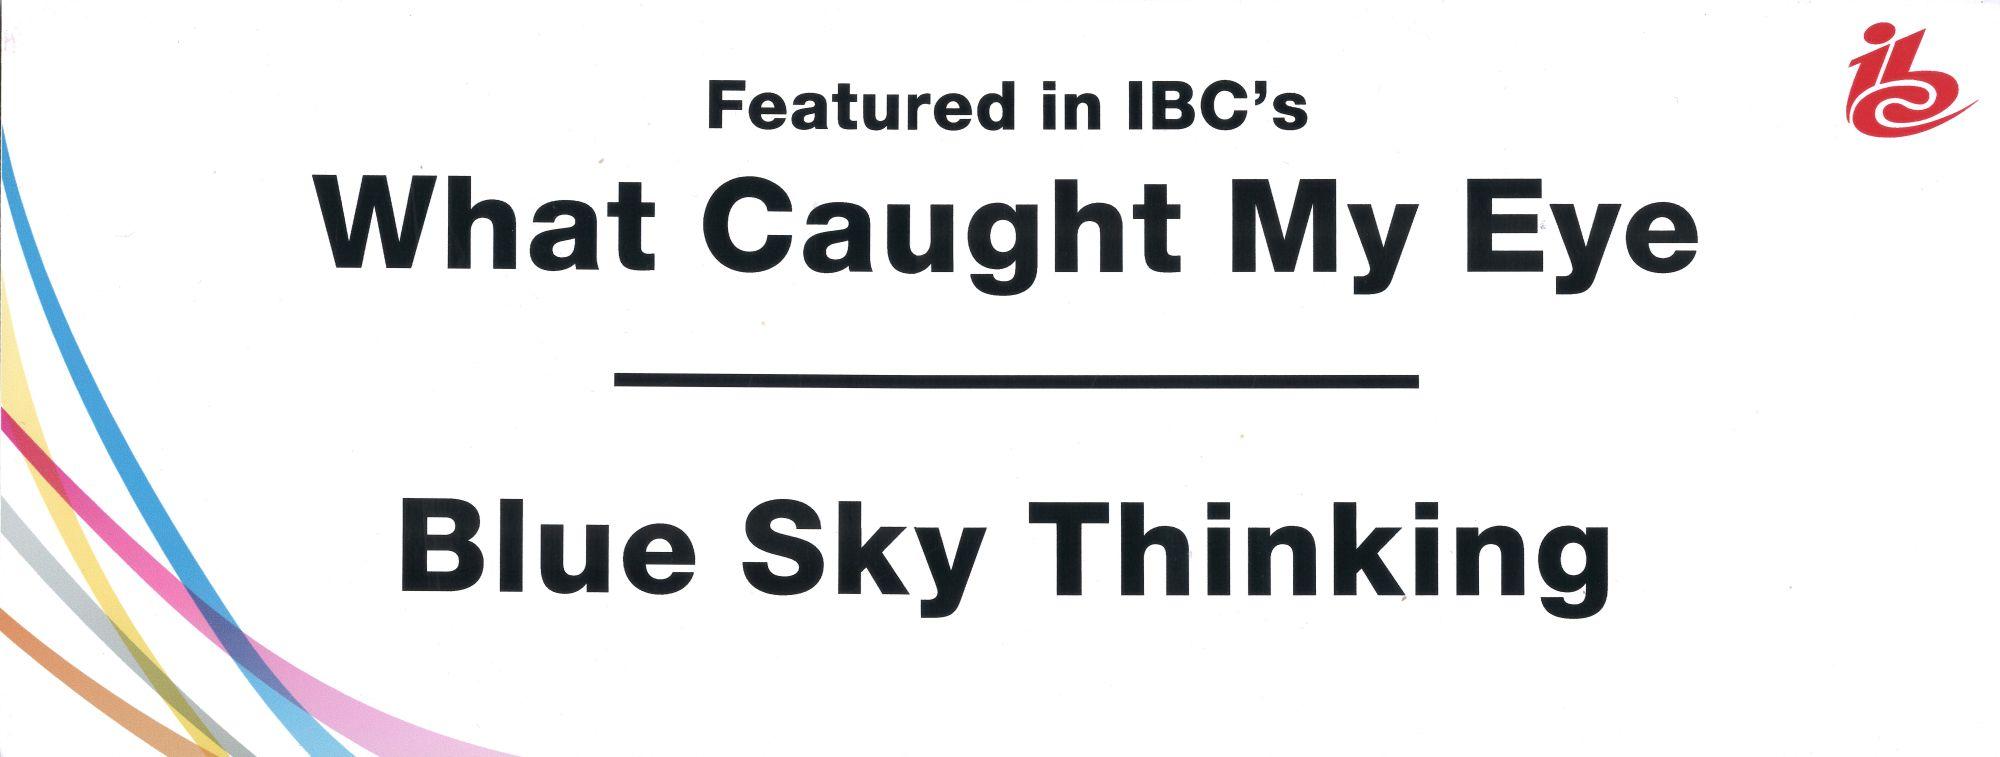 IBC-What-caughy-my-eye-news2.jpg